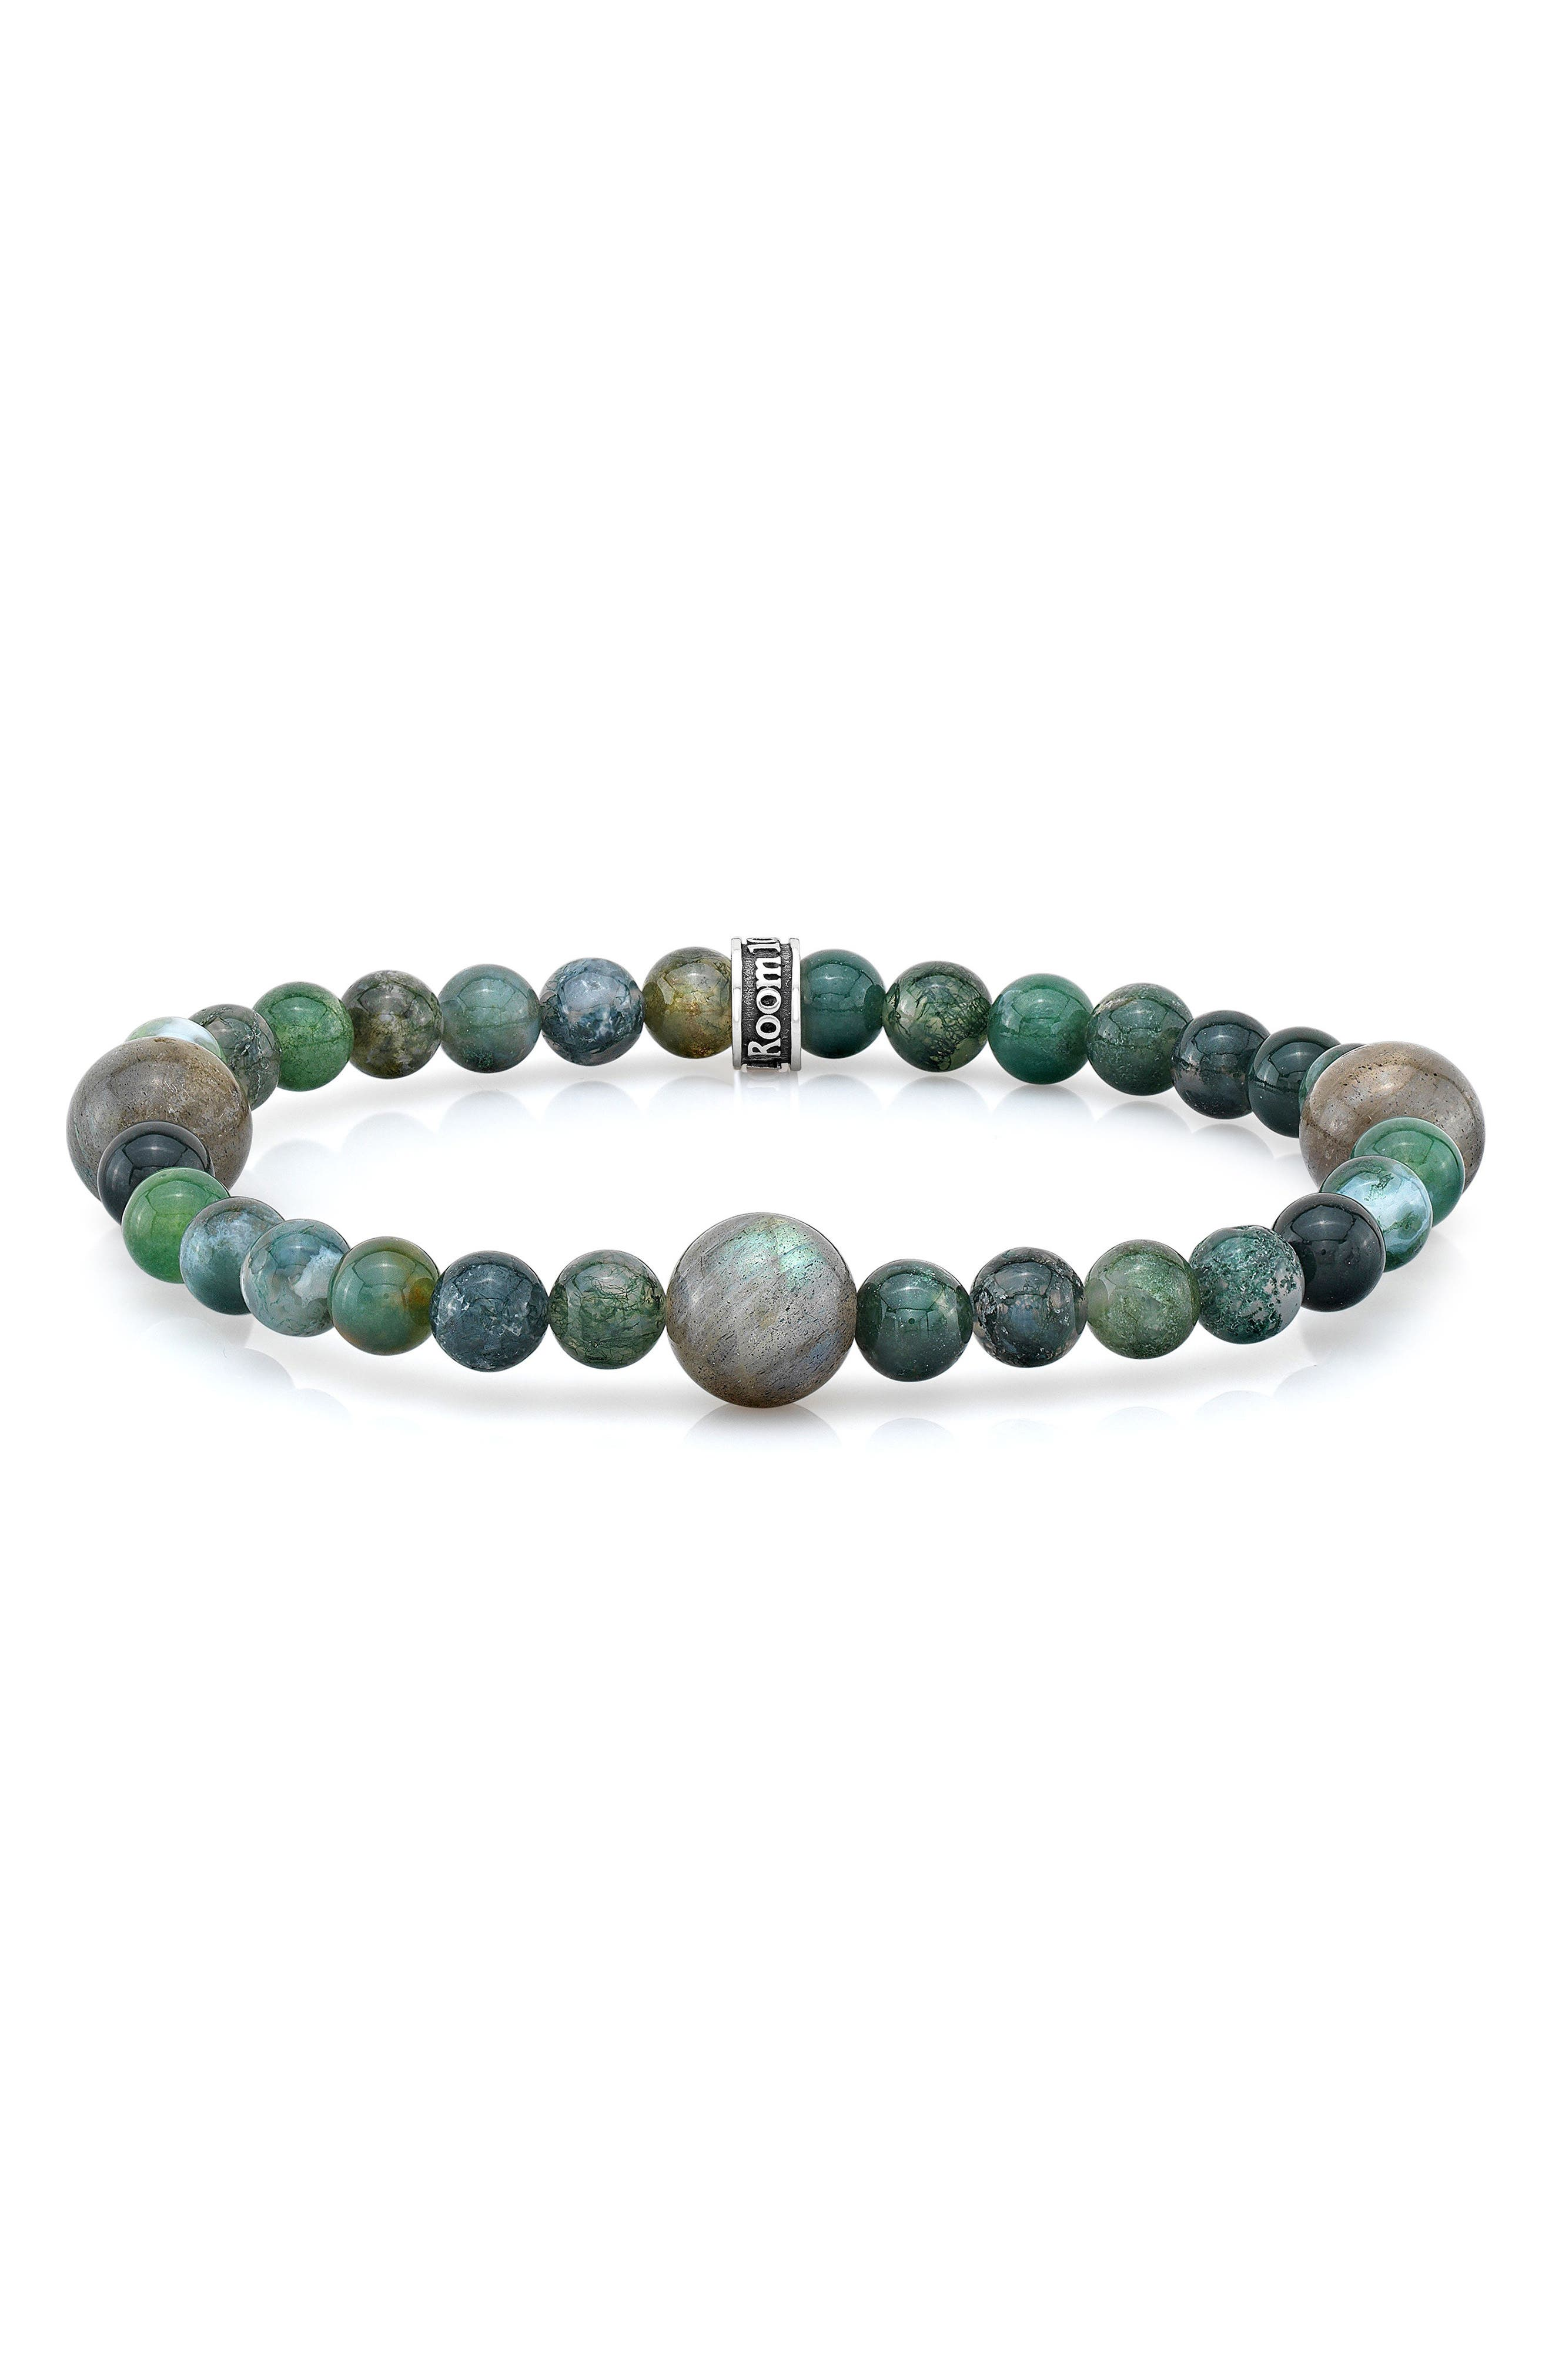 Moss Agate & Labradorite Bead Bracelet,                             Main thumbnail 1, color,                             Green